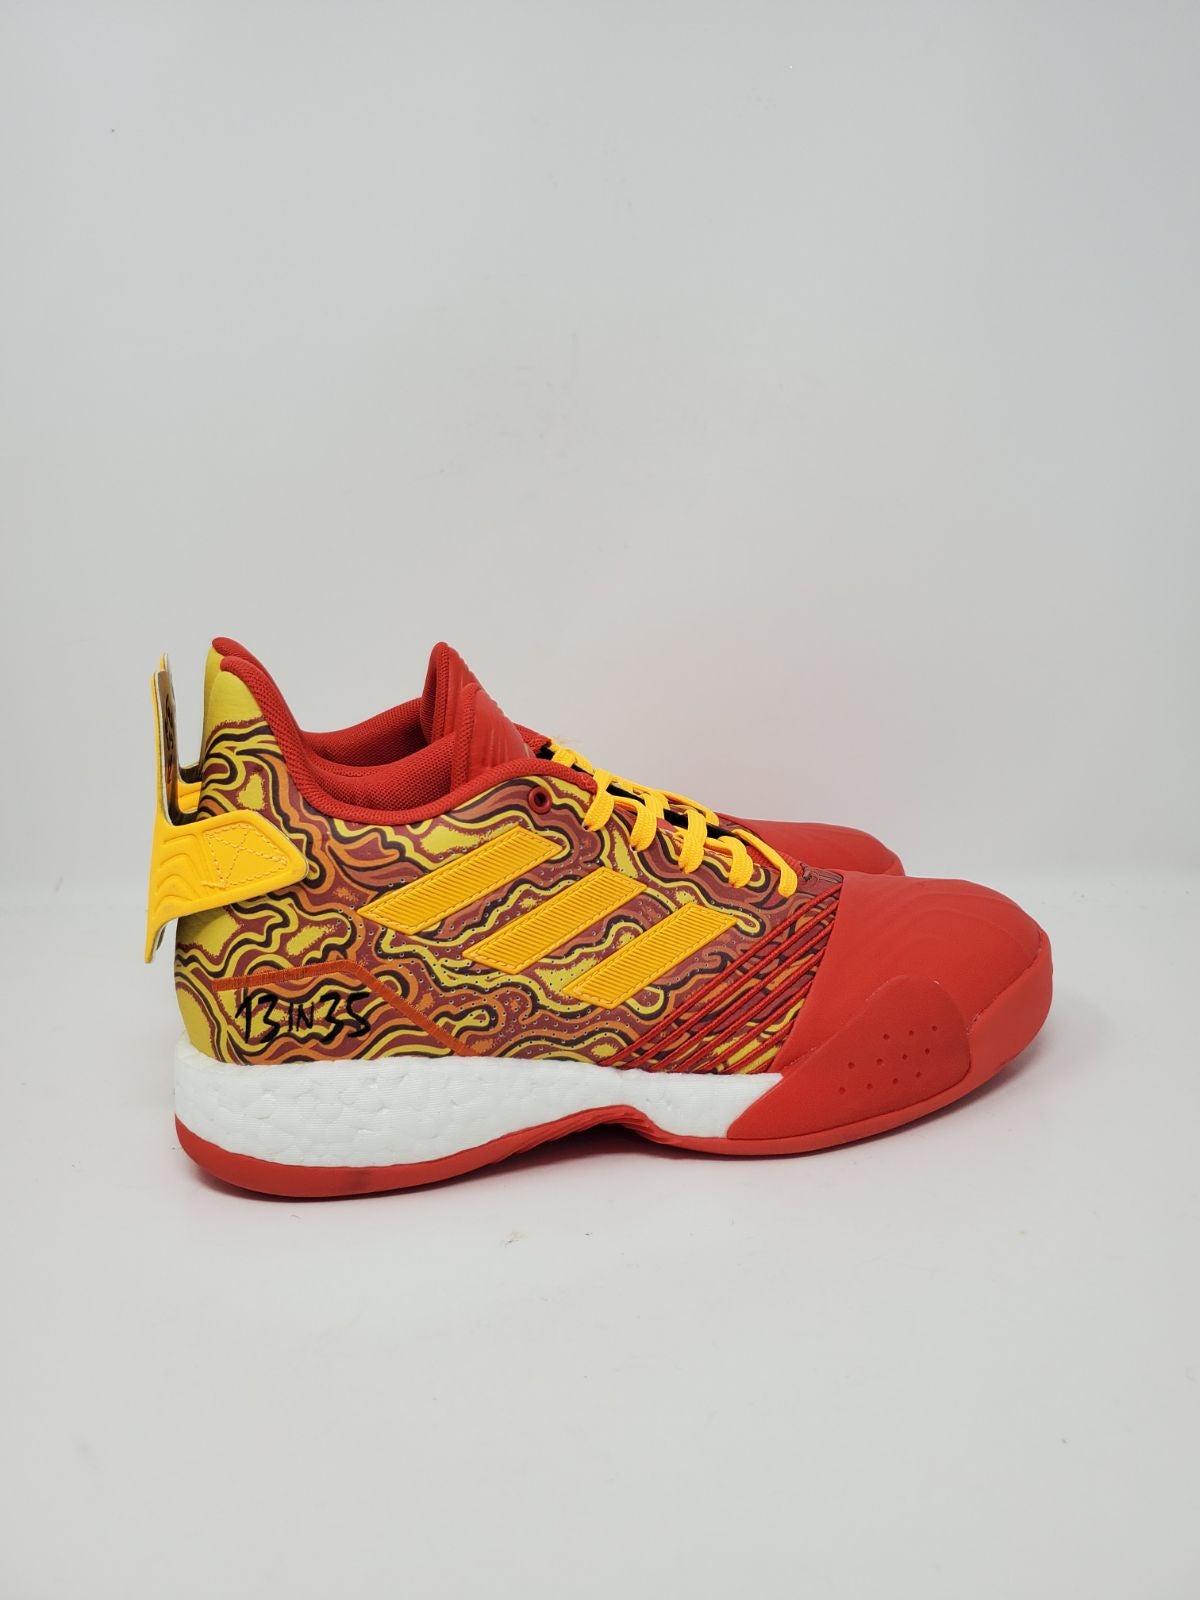 New adidas T-MAC basketball shoes